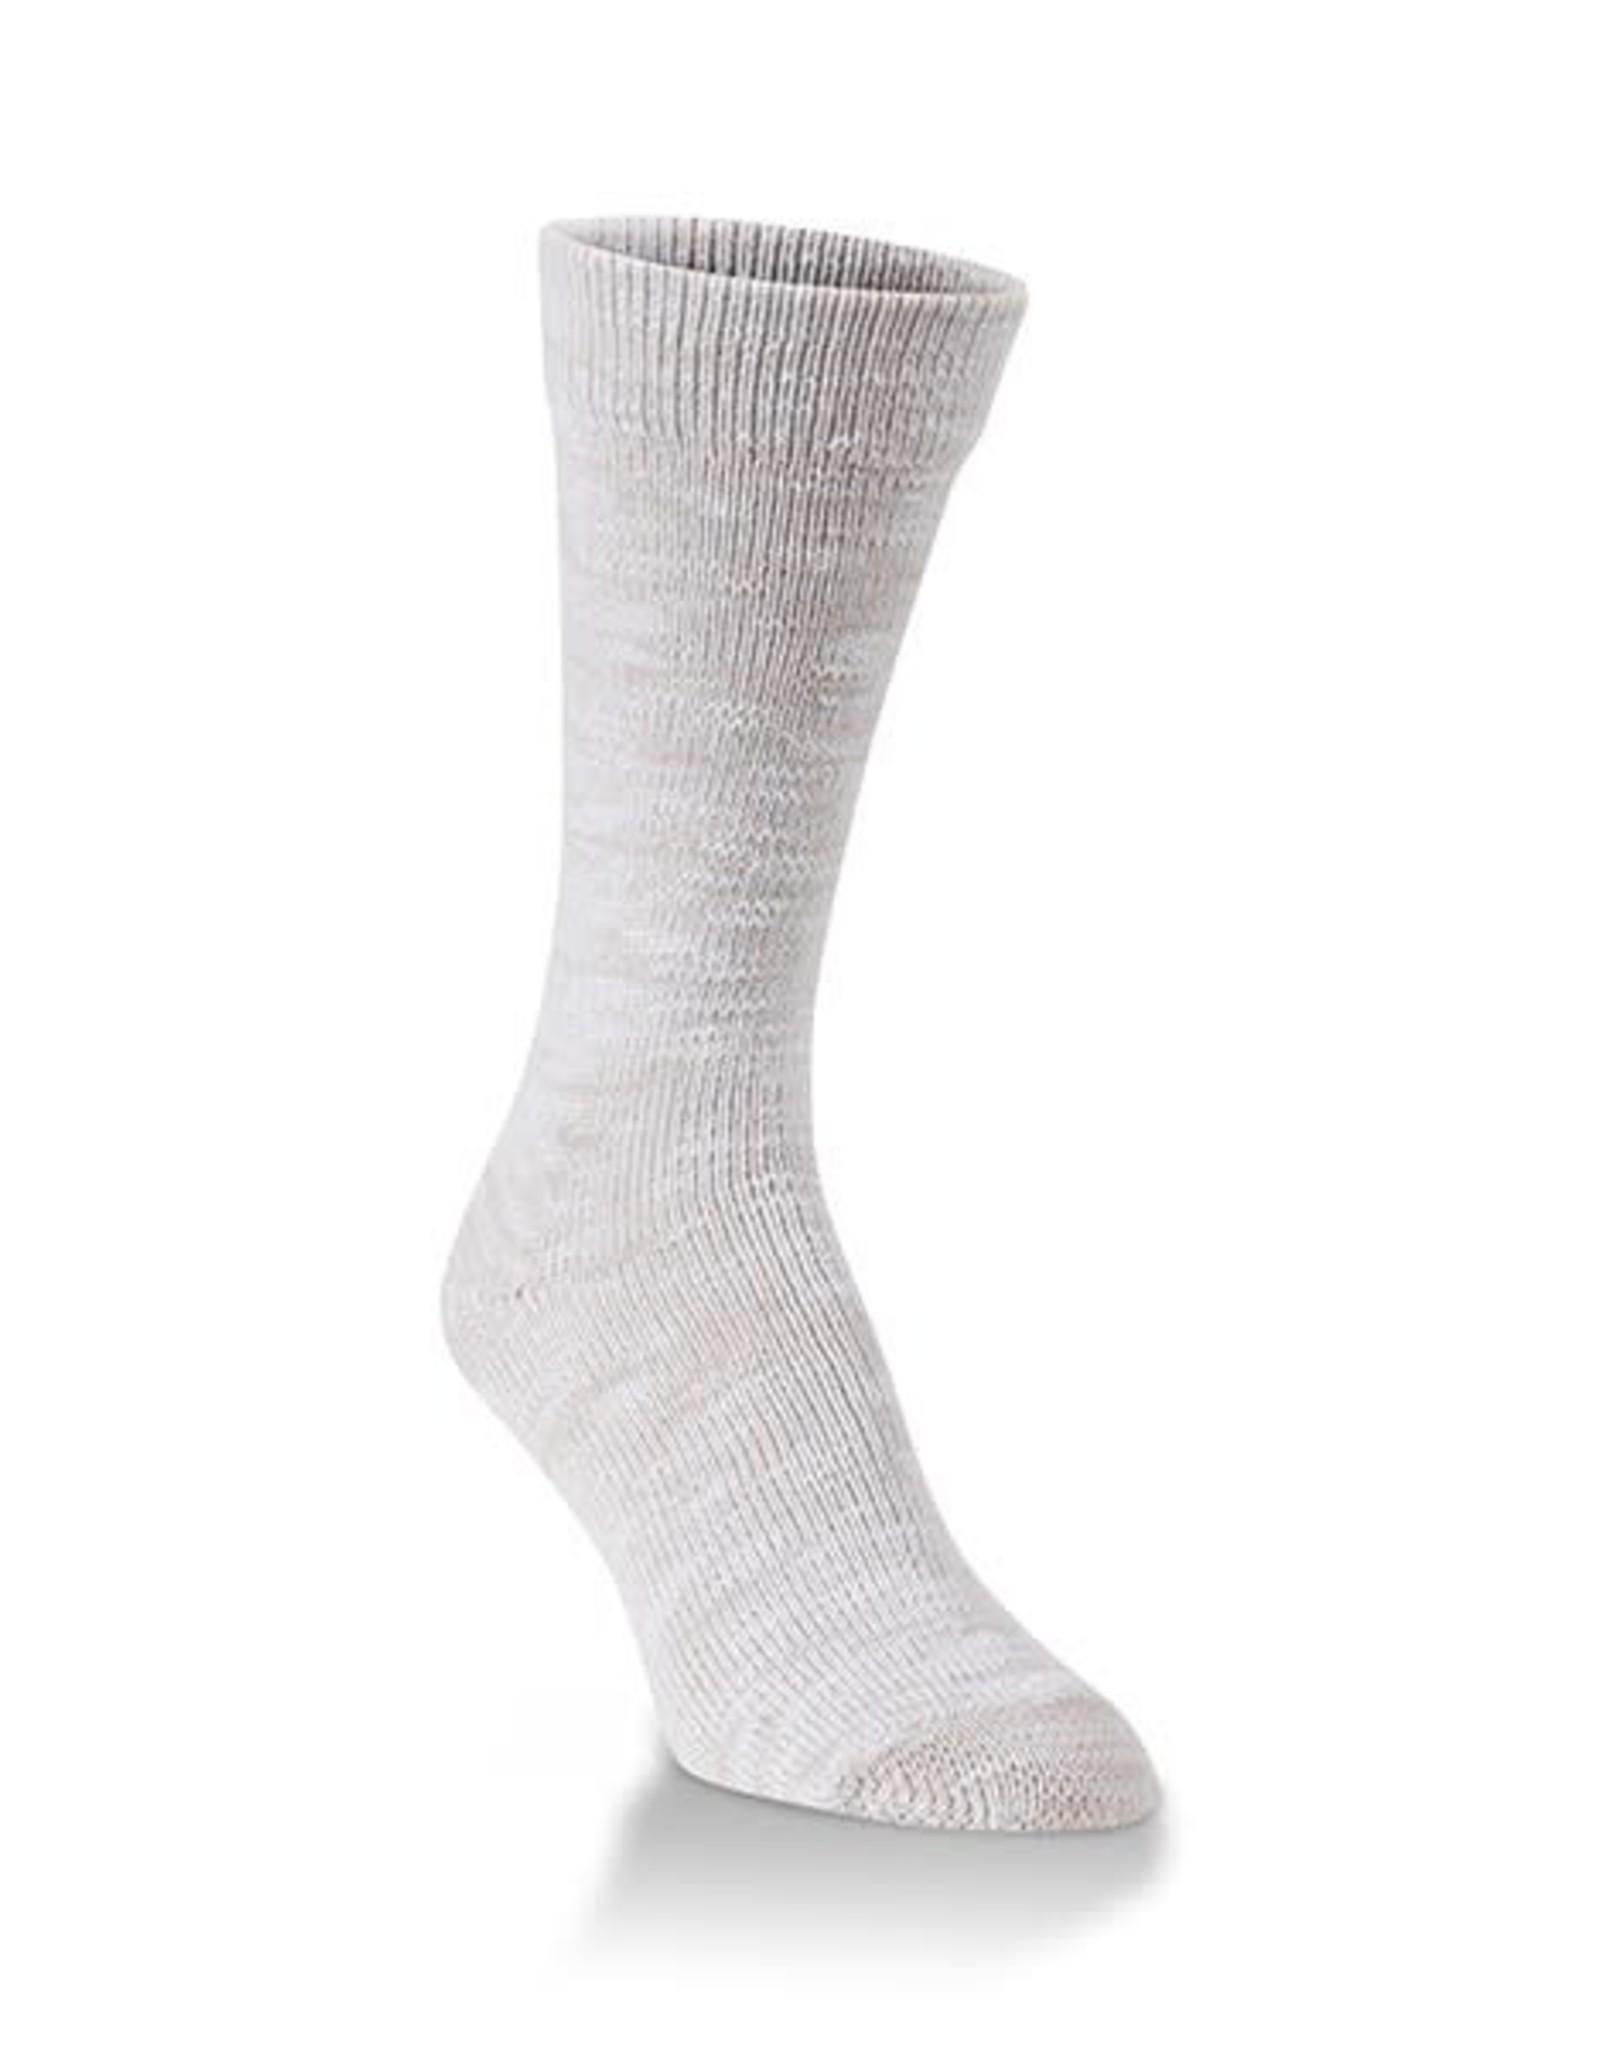 Crescent Sock Co World's Softest Socks - Oatmeal